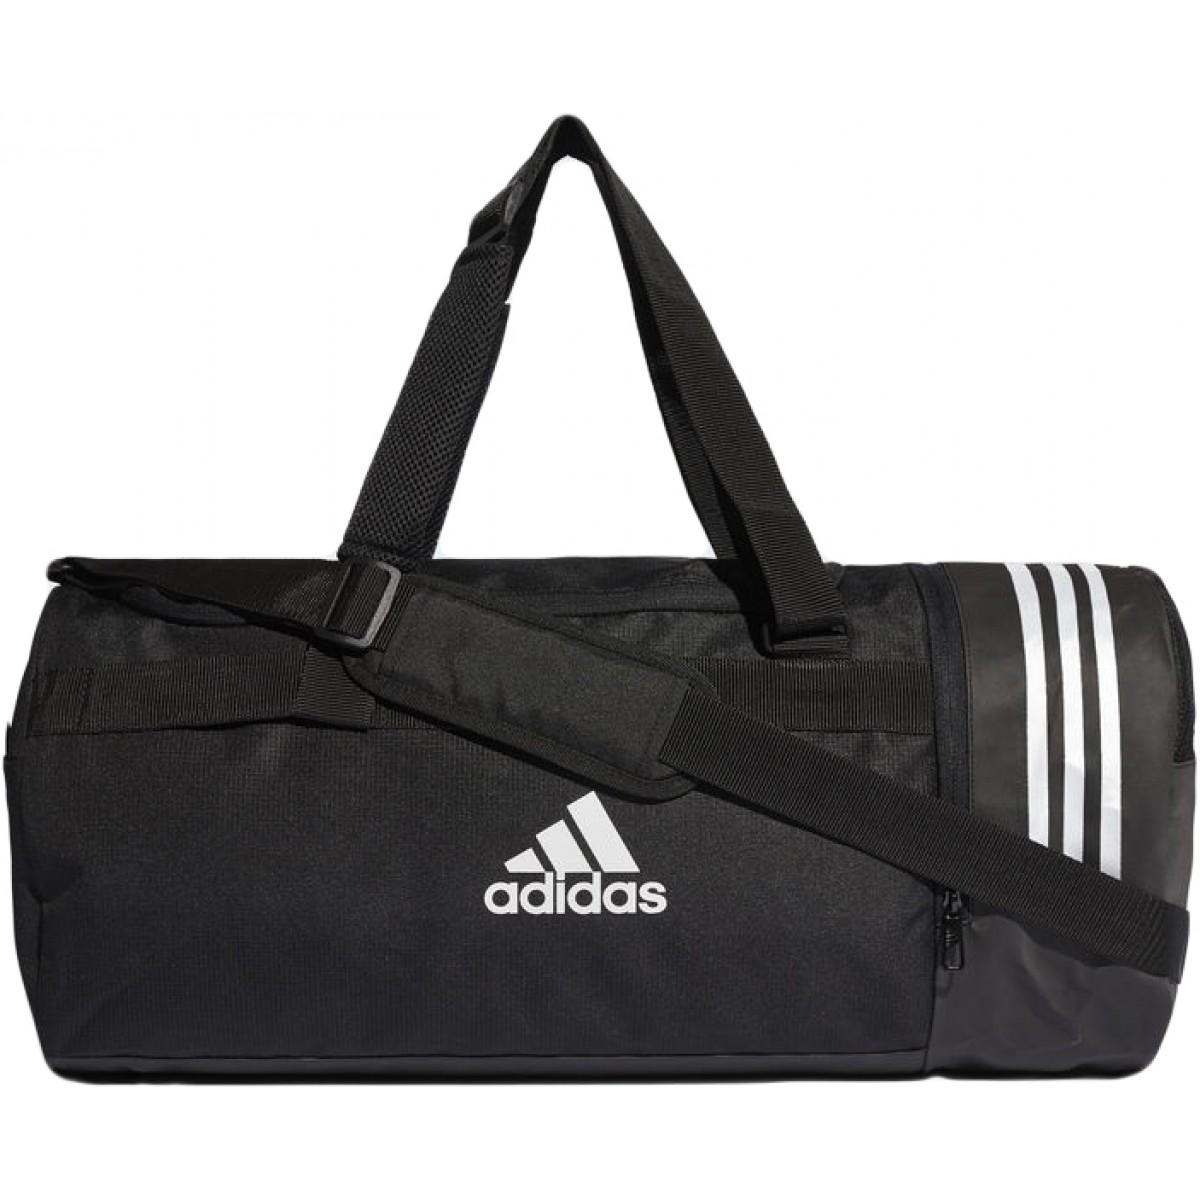 Sport Sac SacsTennispro Adidas De Athlete QxeWBdECor